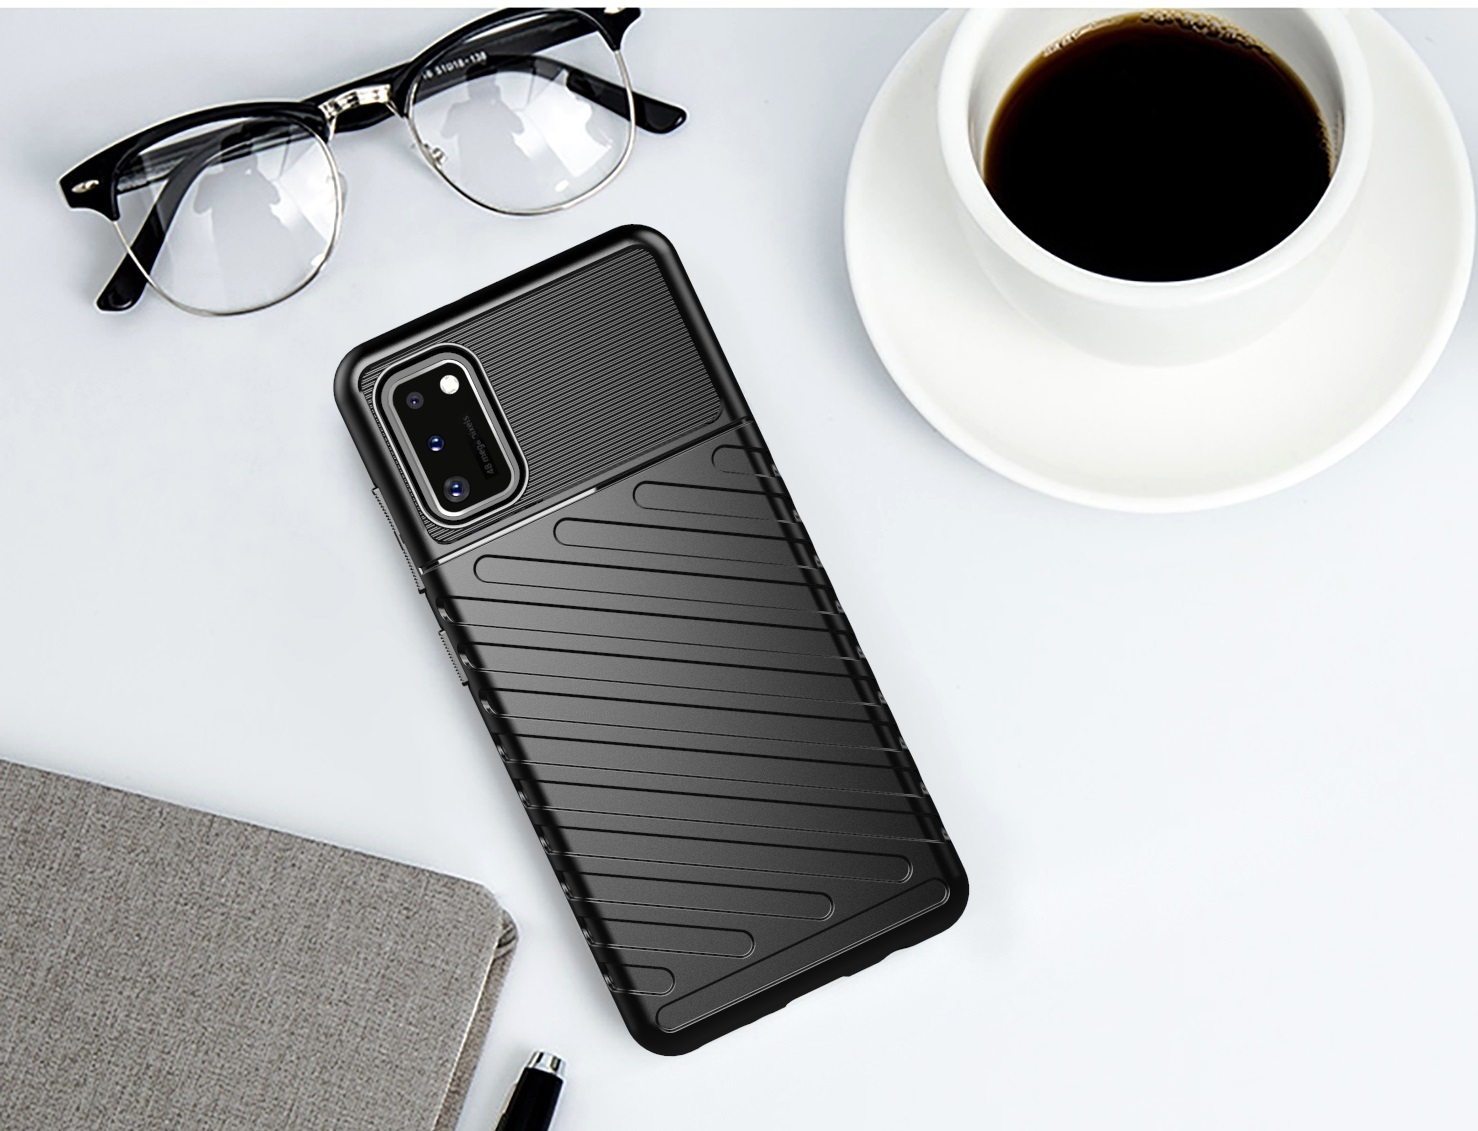 Чехол на телефон Samsung Galaxy A41 черного цвета, серия Onyx, Caseport